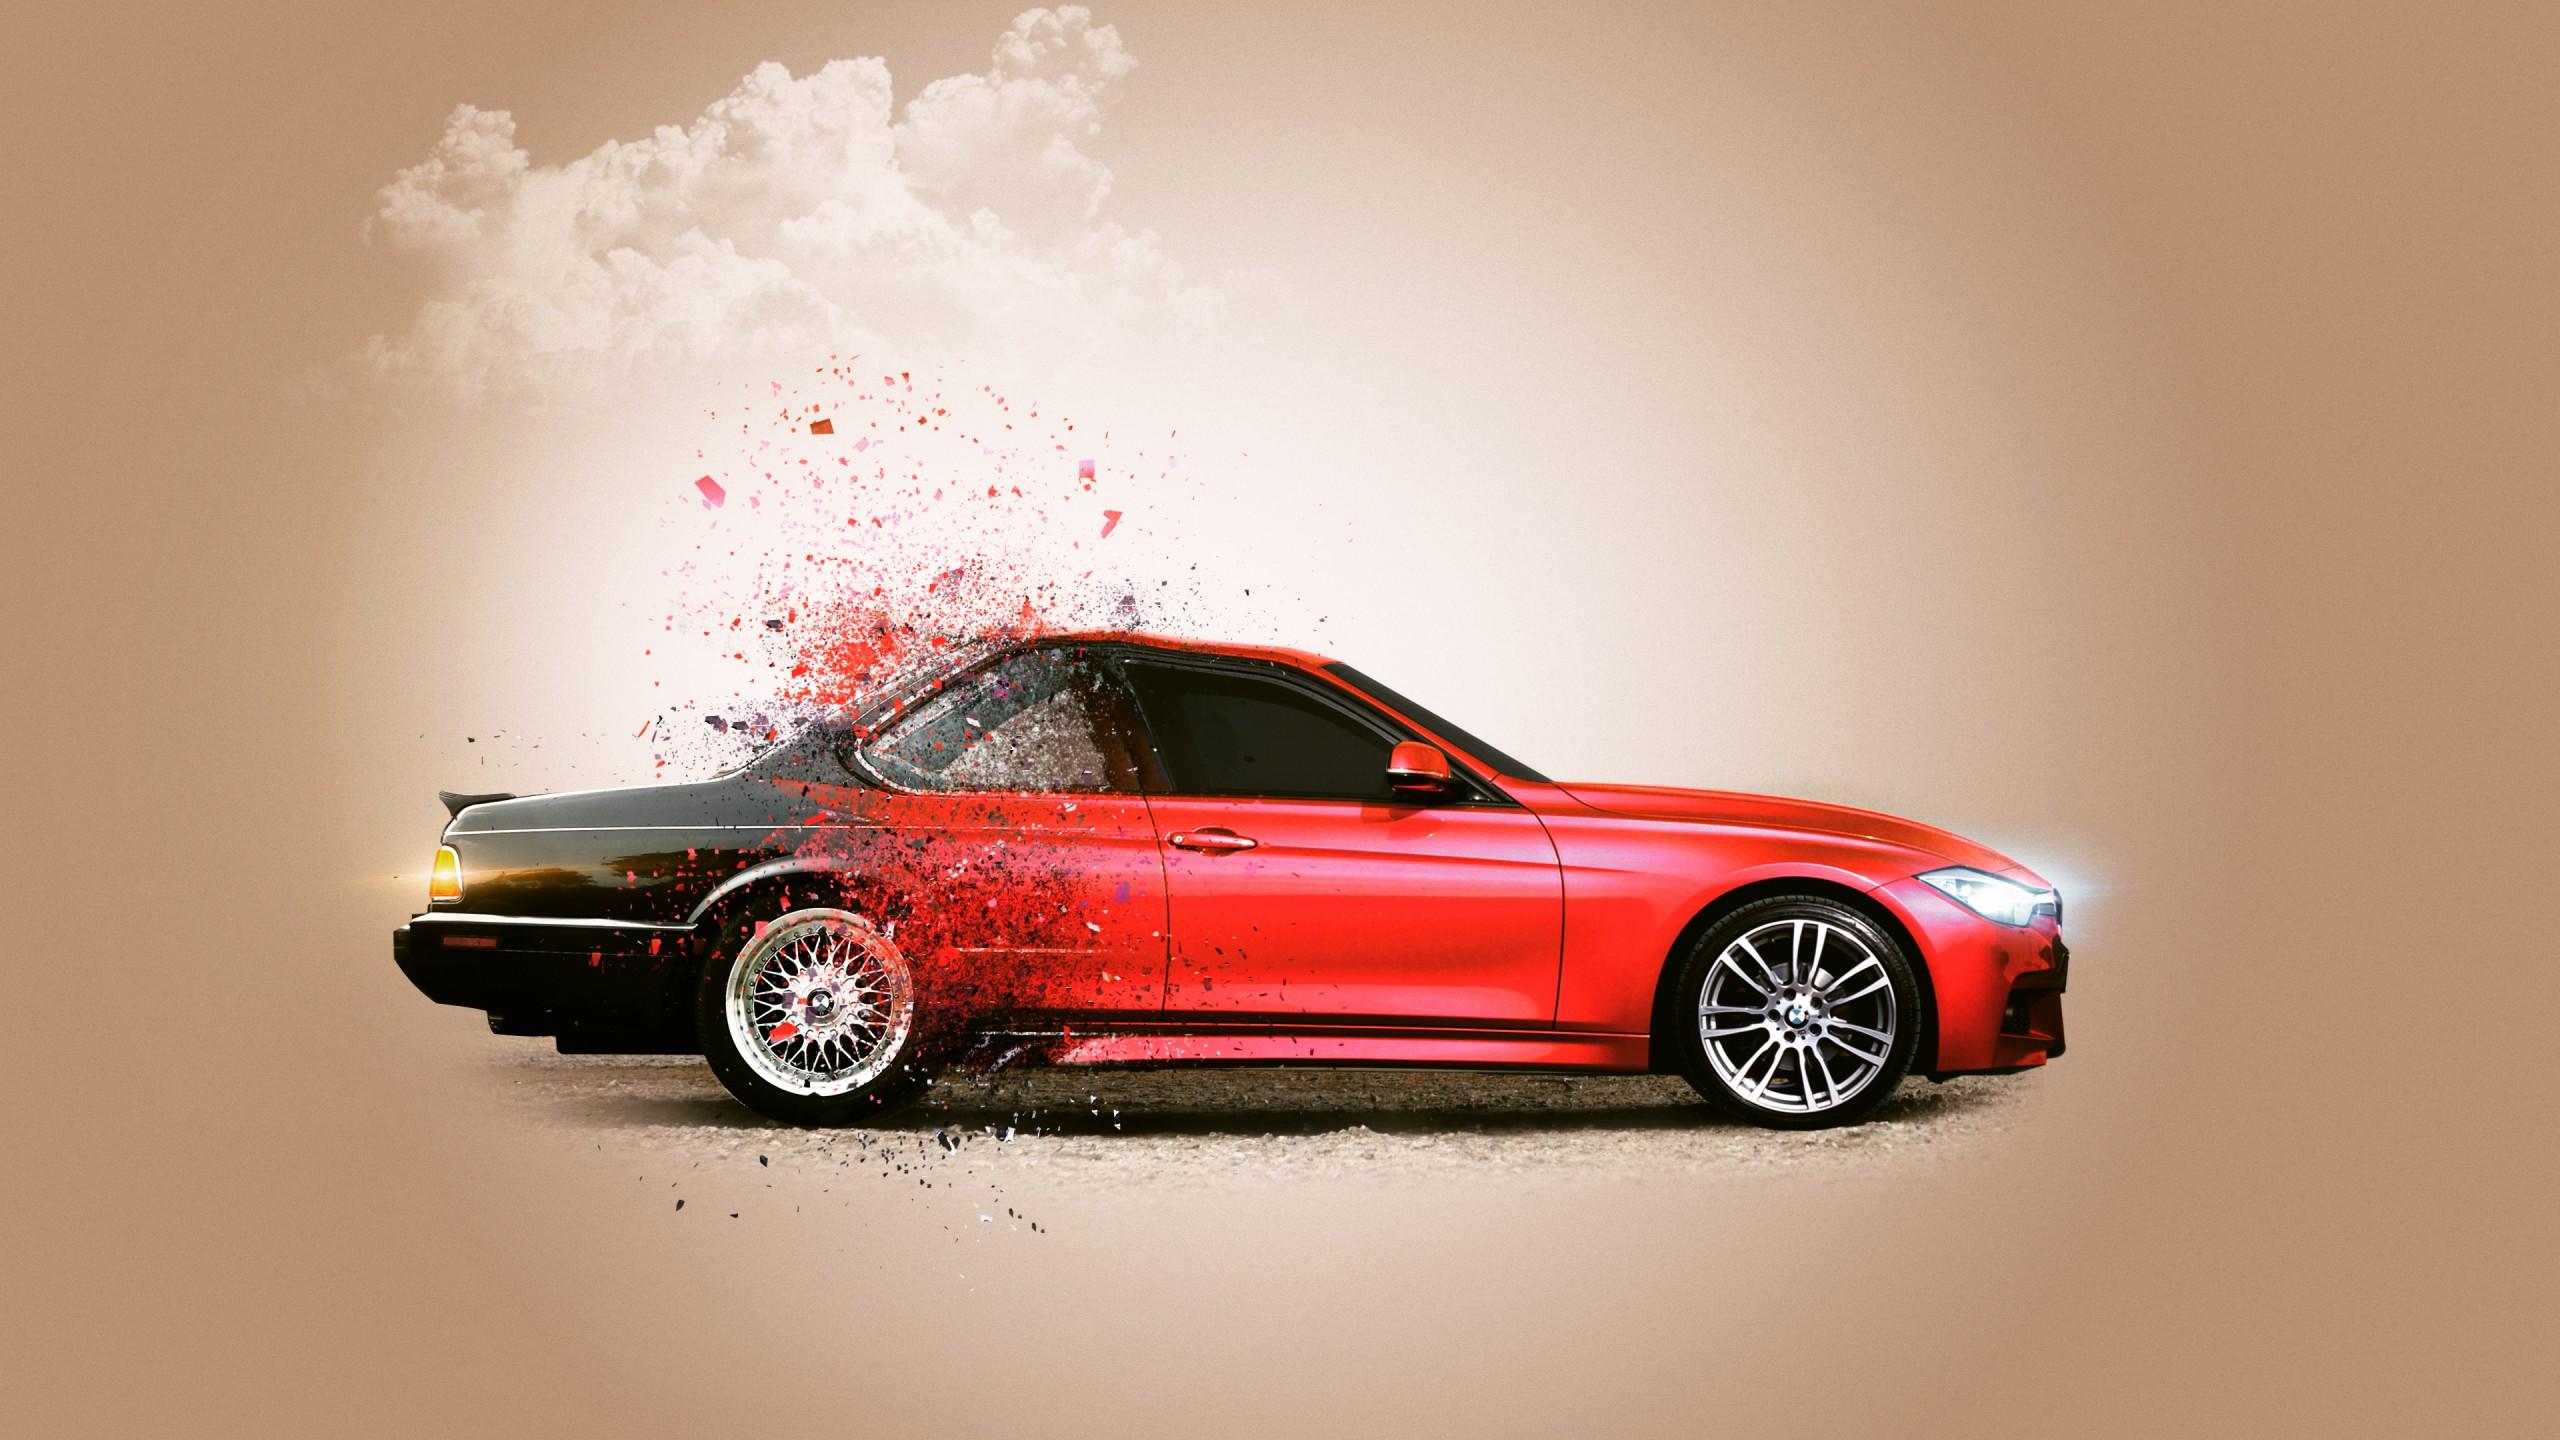 BMW CGI Car 4K Wallpapers | HD Wallpapers